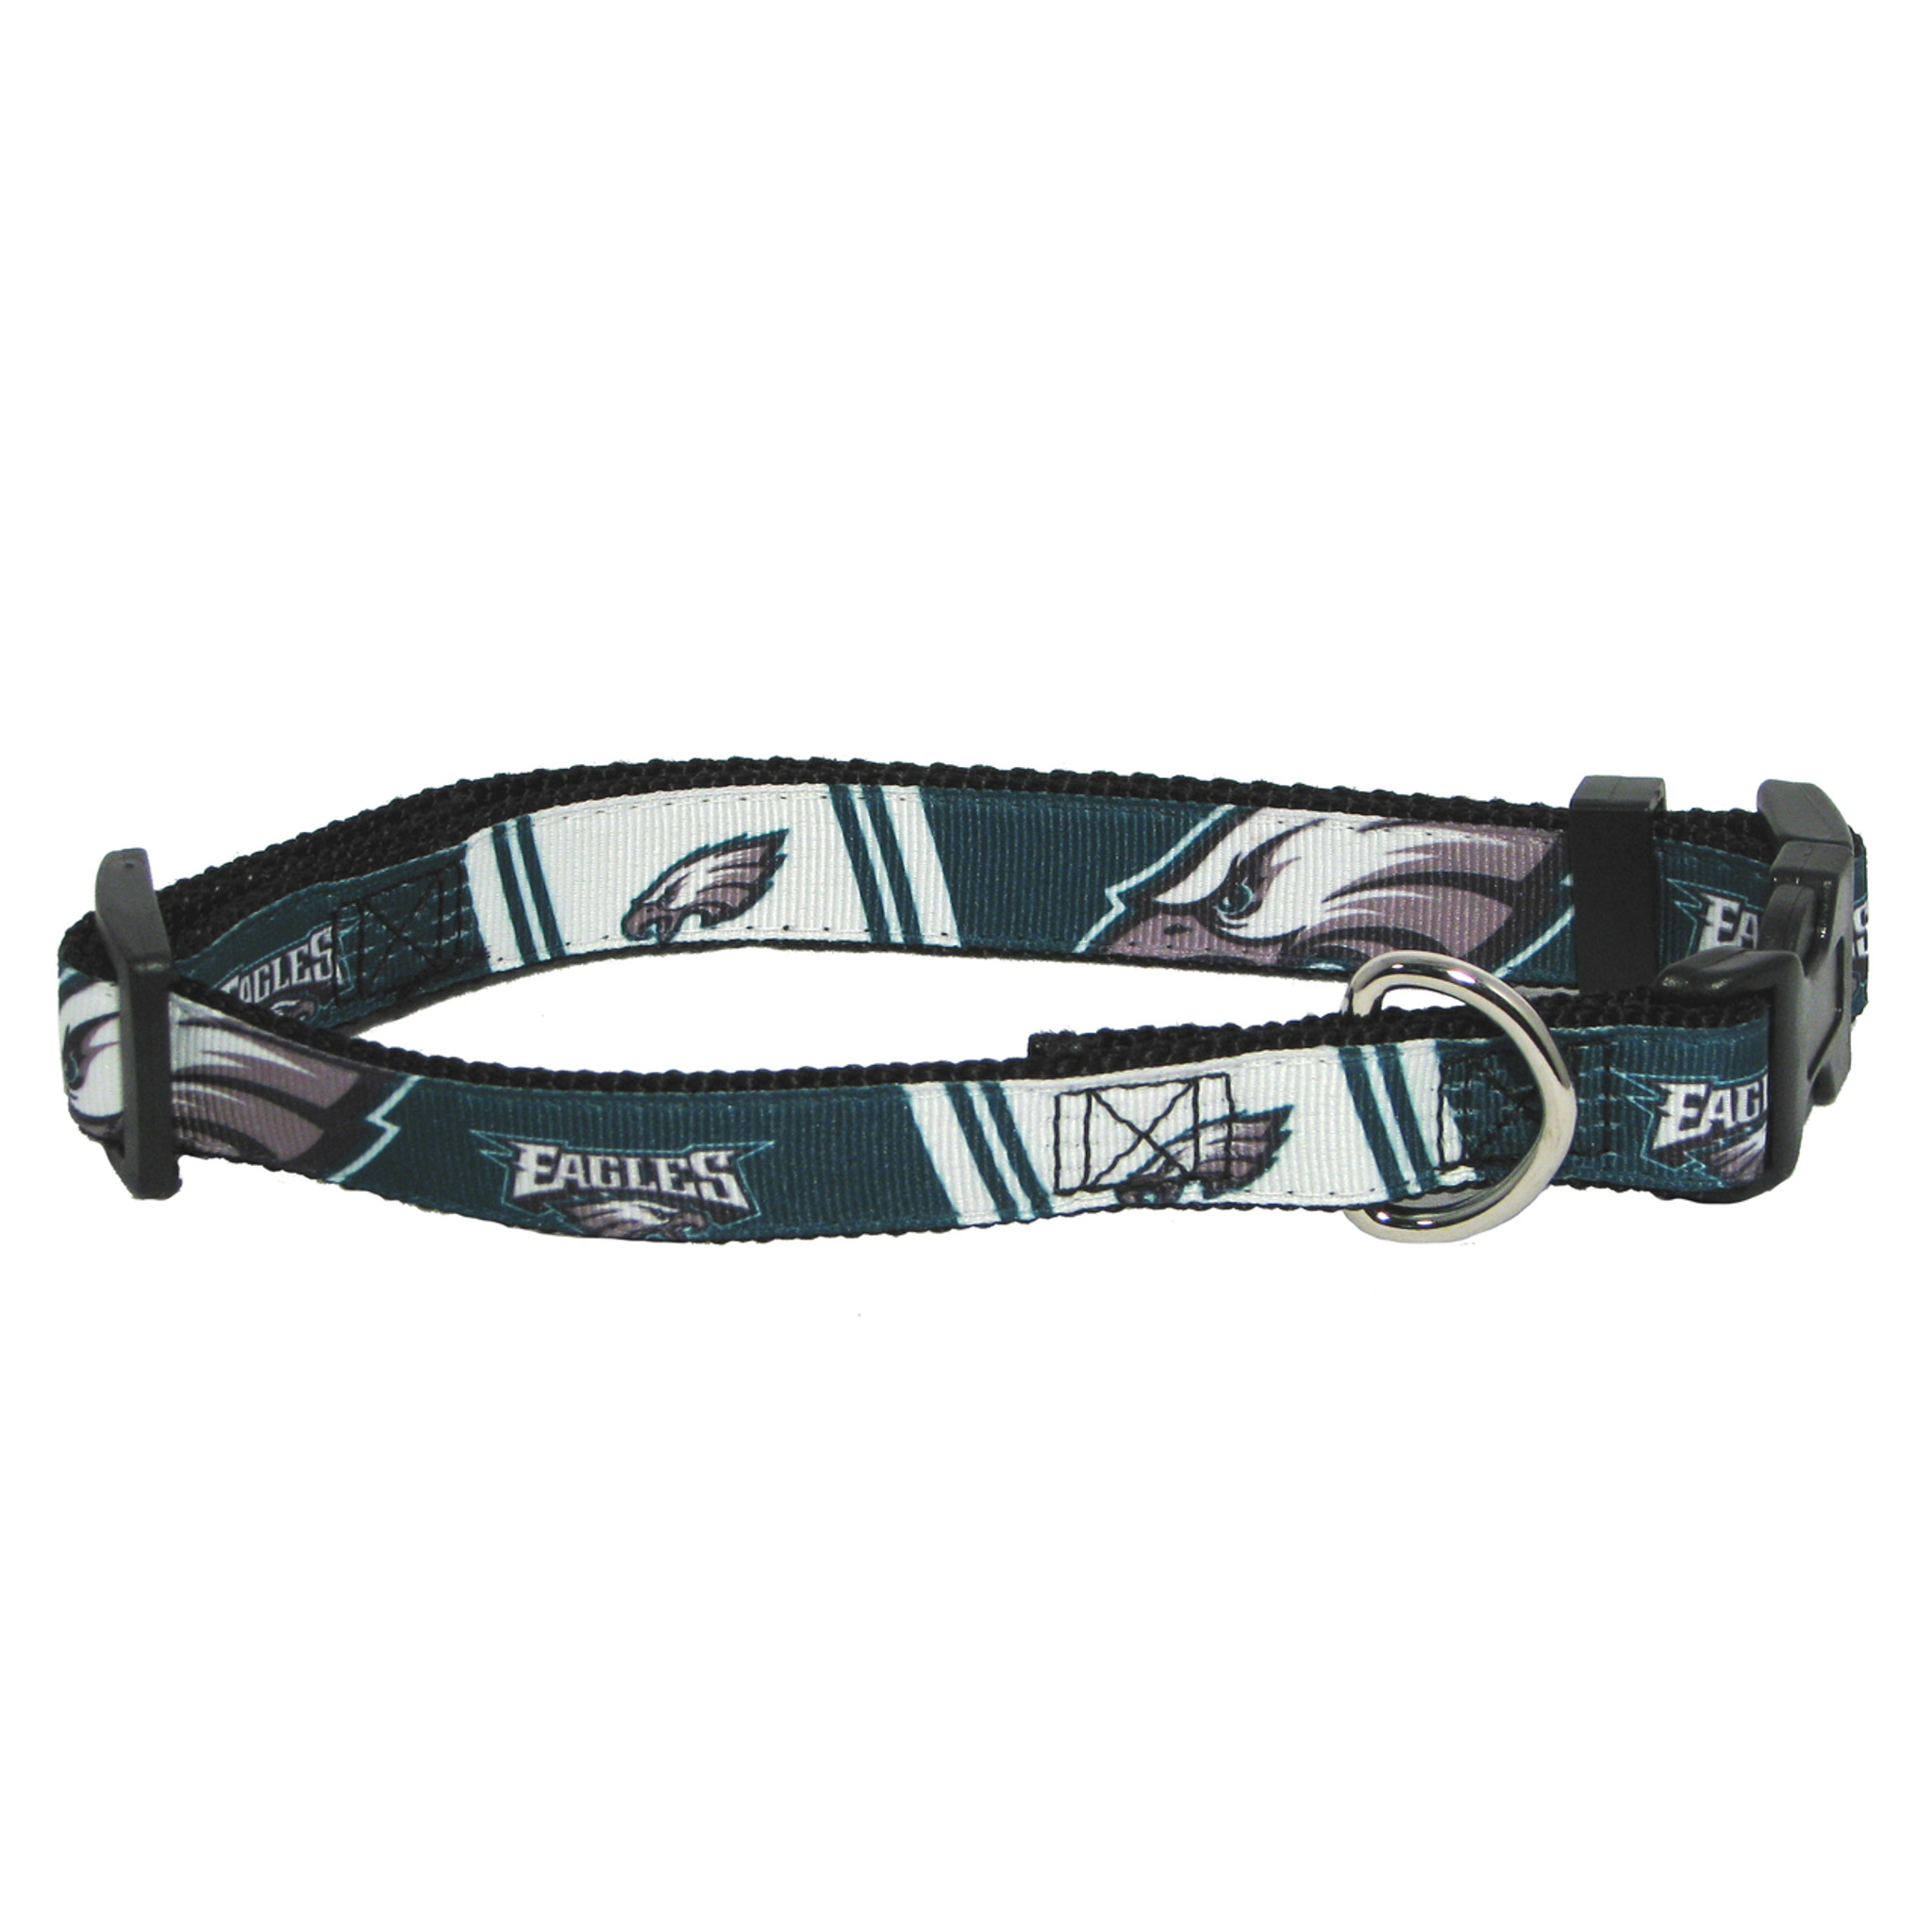 4352b9f63 Philadelphia Eagles Dog Pet Premium Adjustable Nylon Collar - Spawty